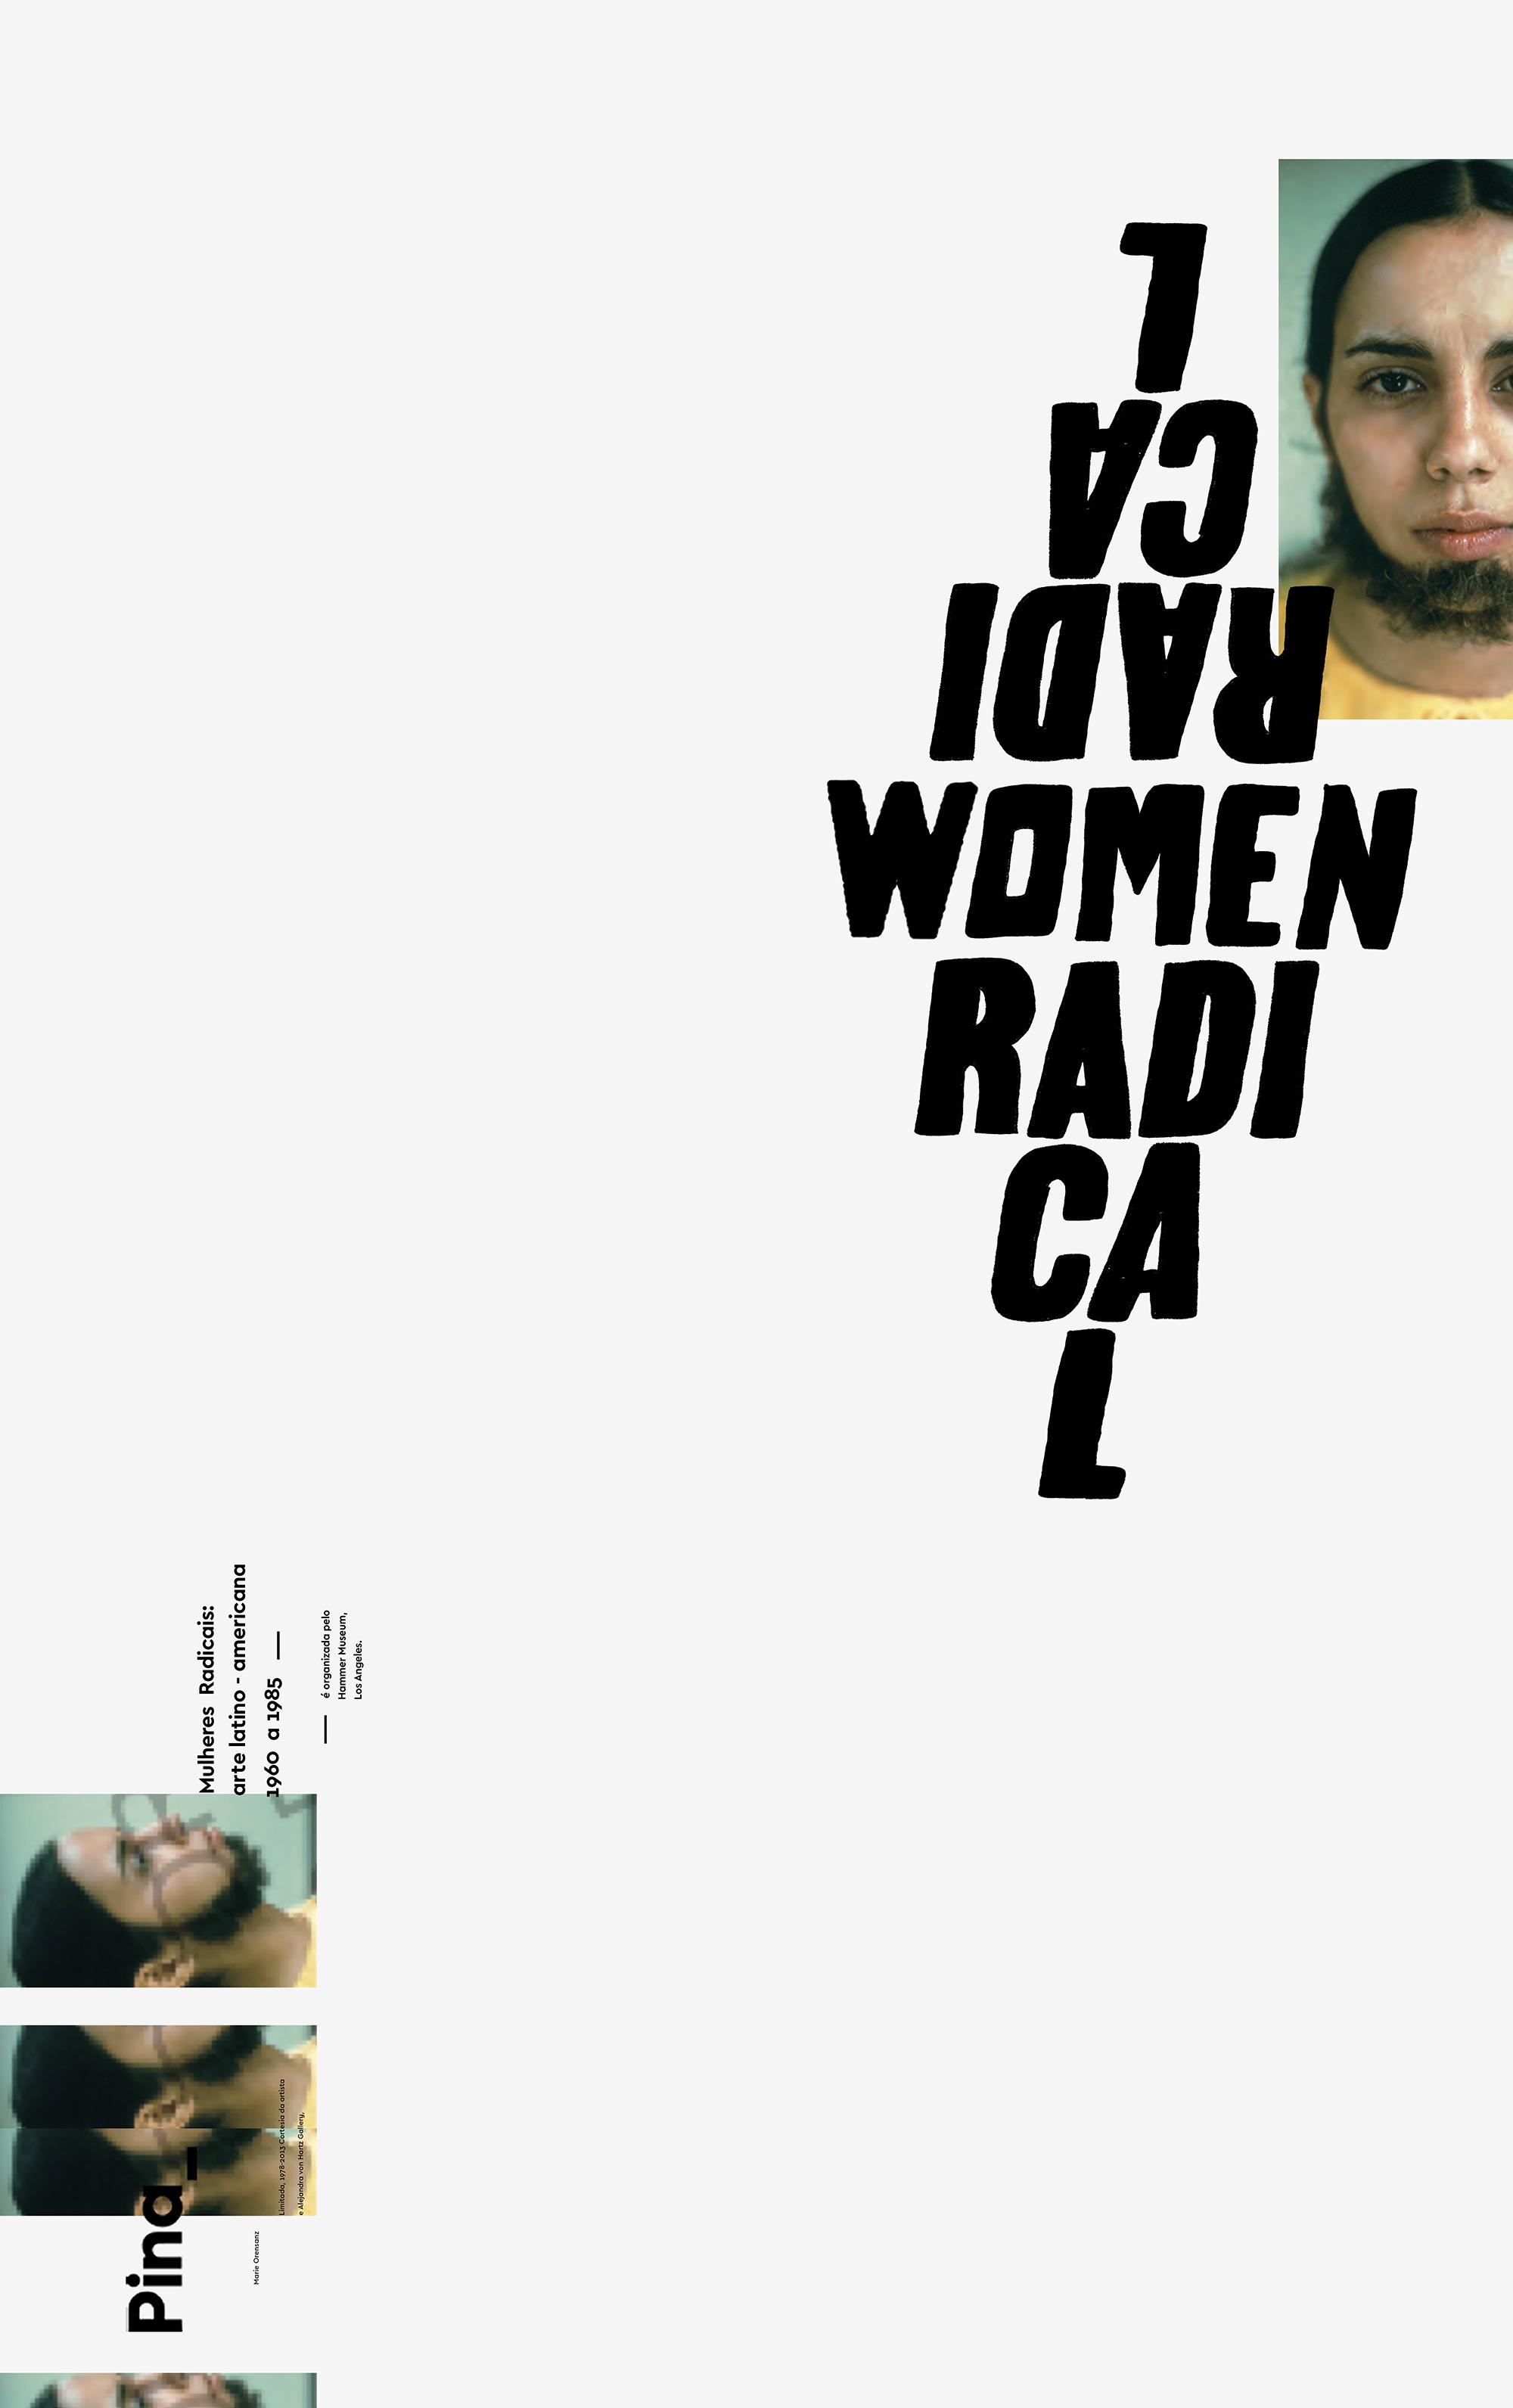 Poster-6-copy